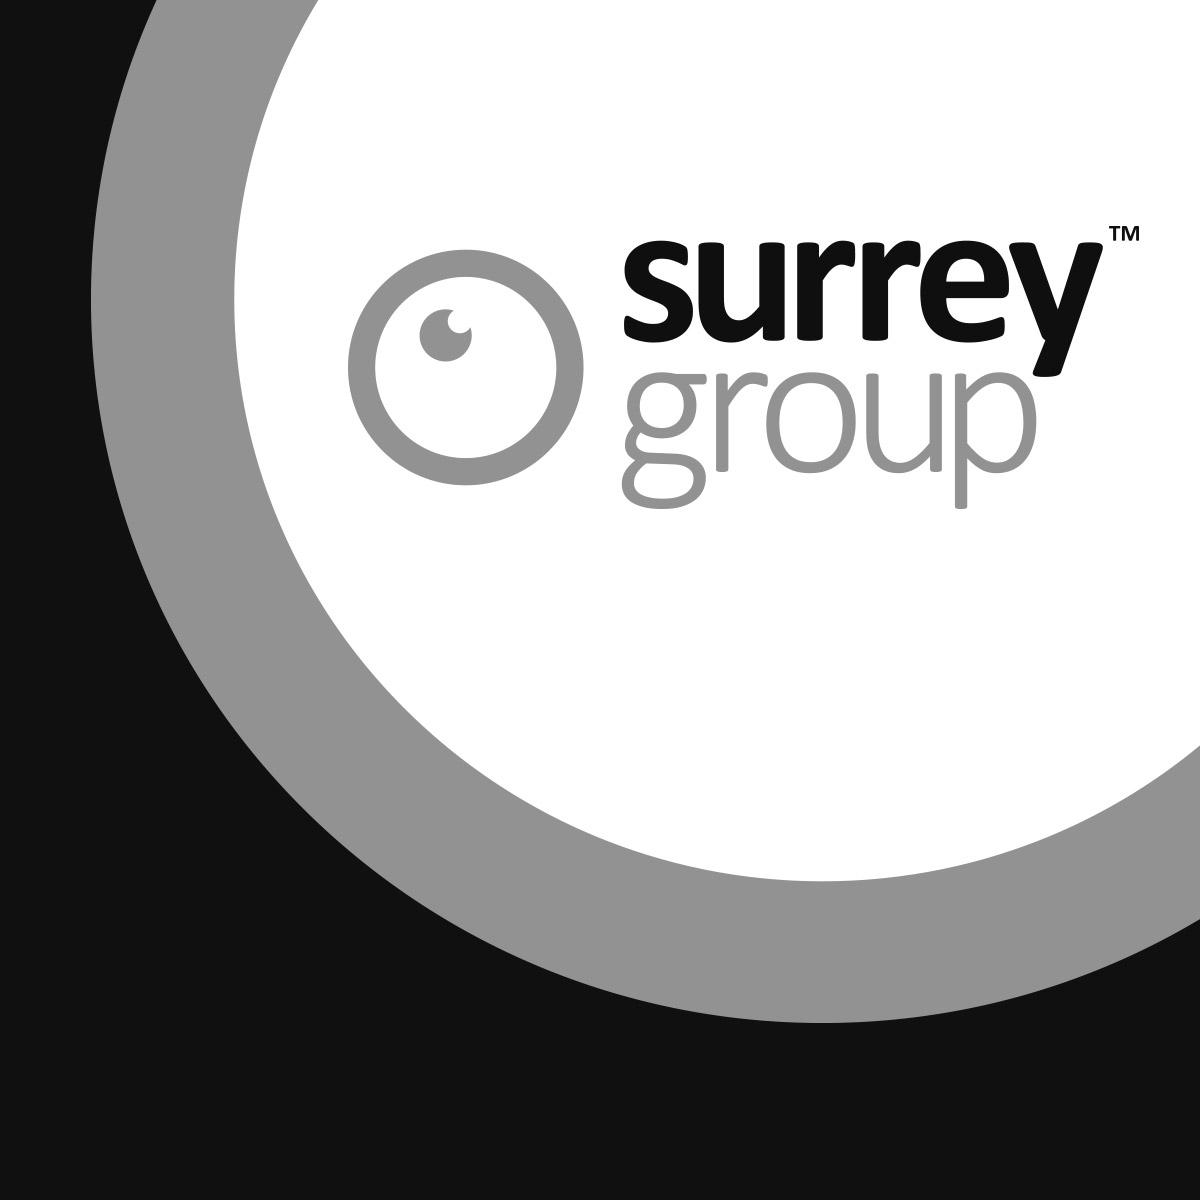 Surrey Group